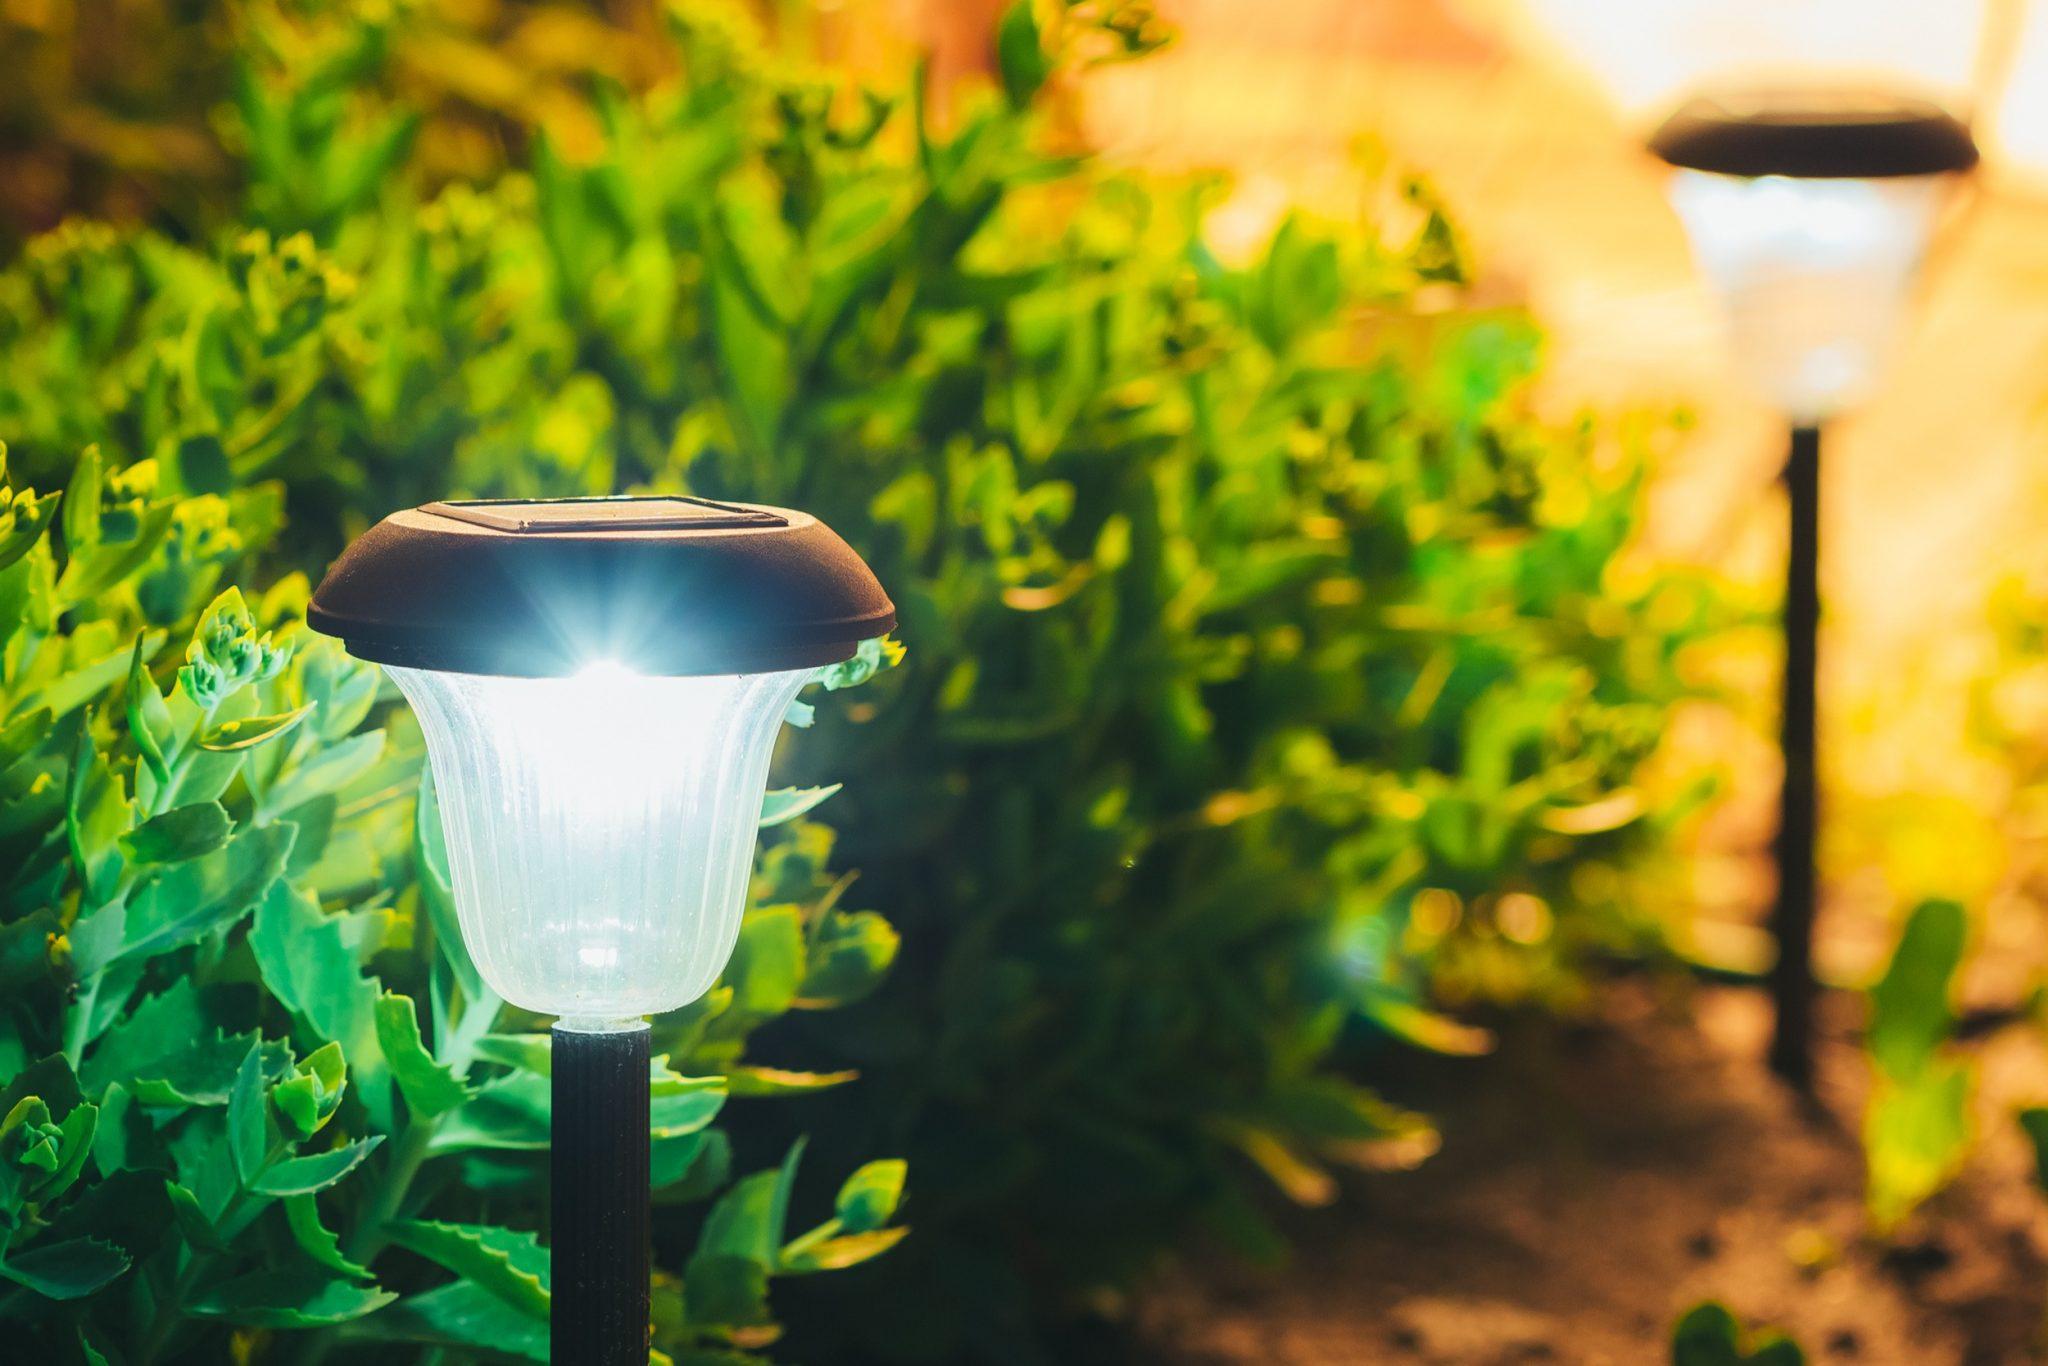 solar landscape lighting near garden